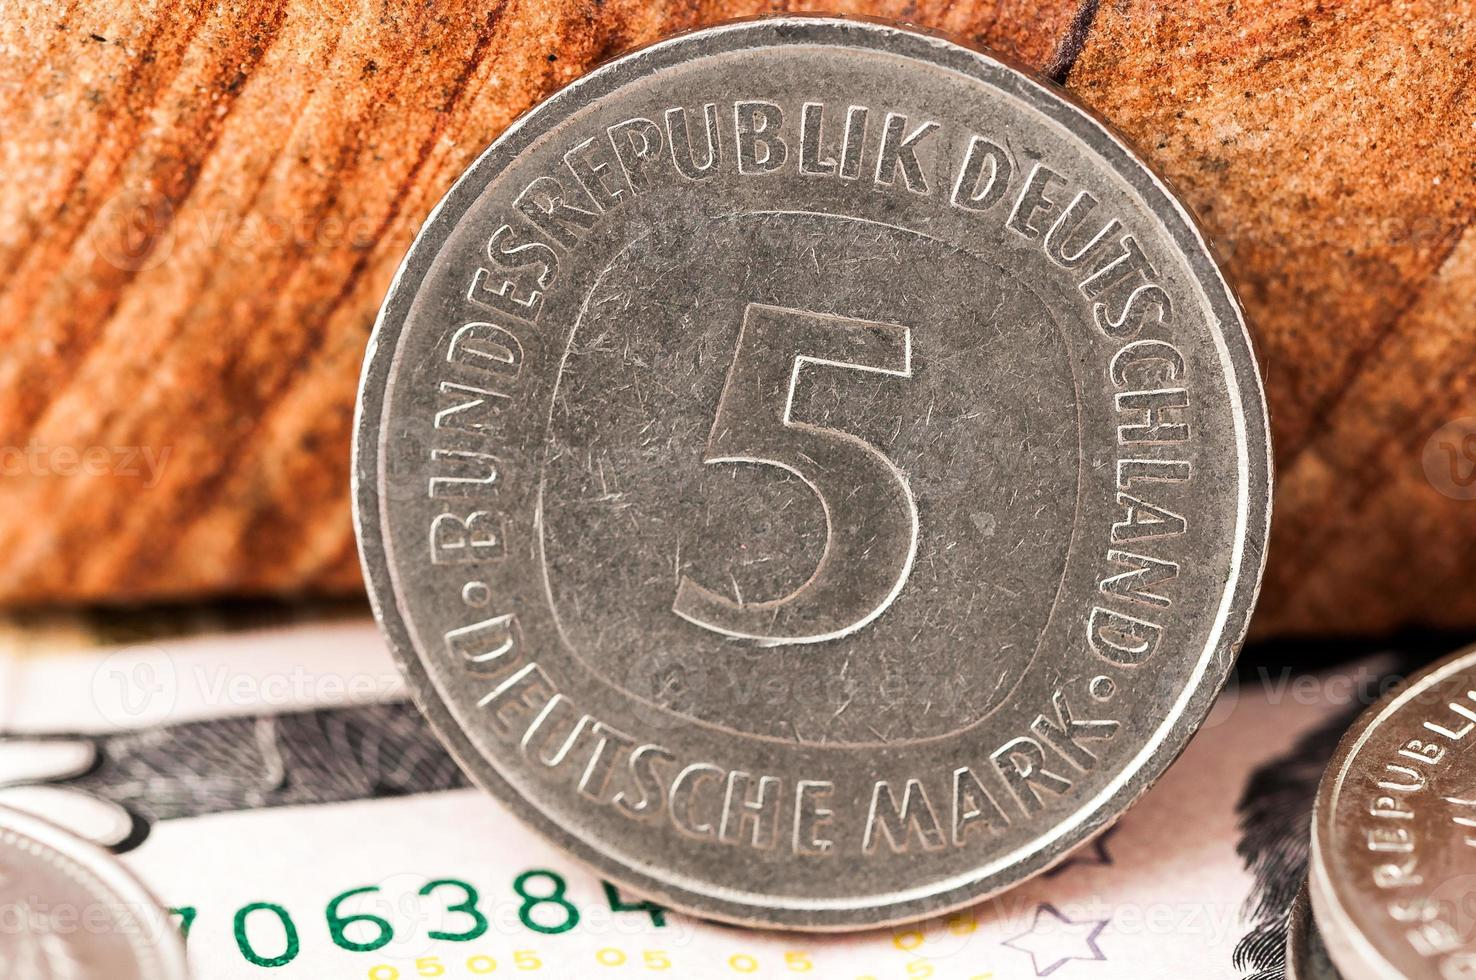 5 vijf Duitse mark bundesrepubik deutschland foto